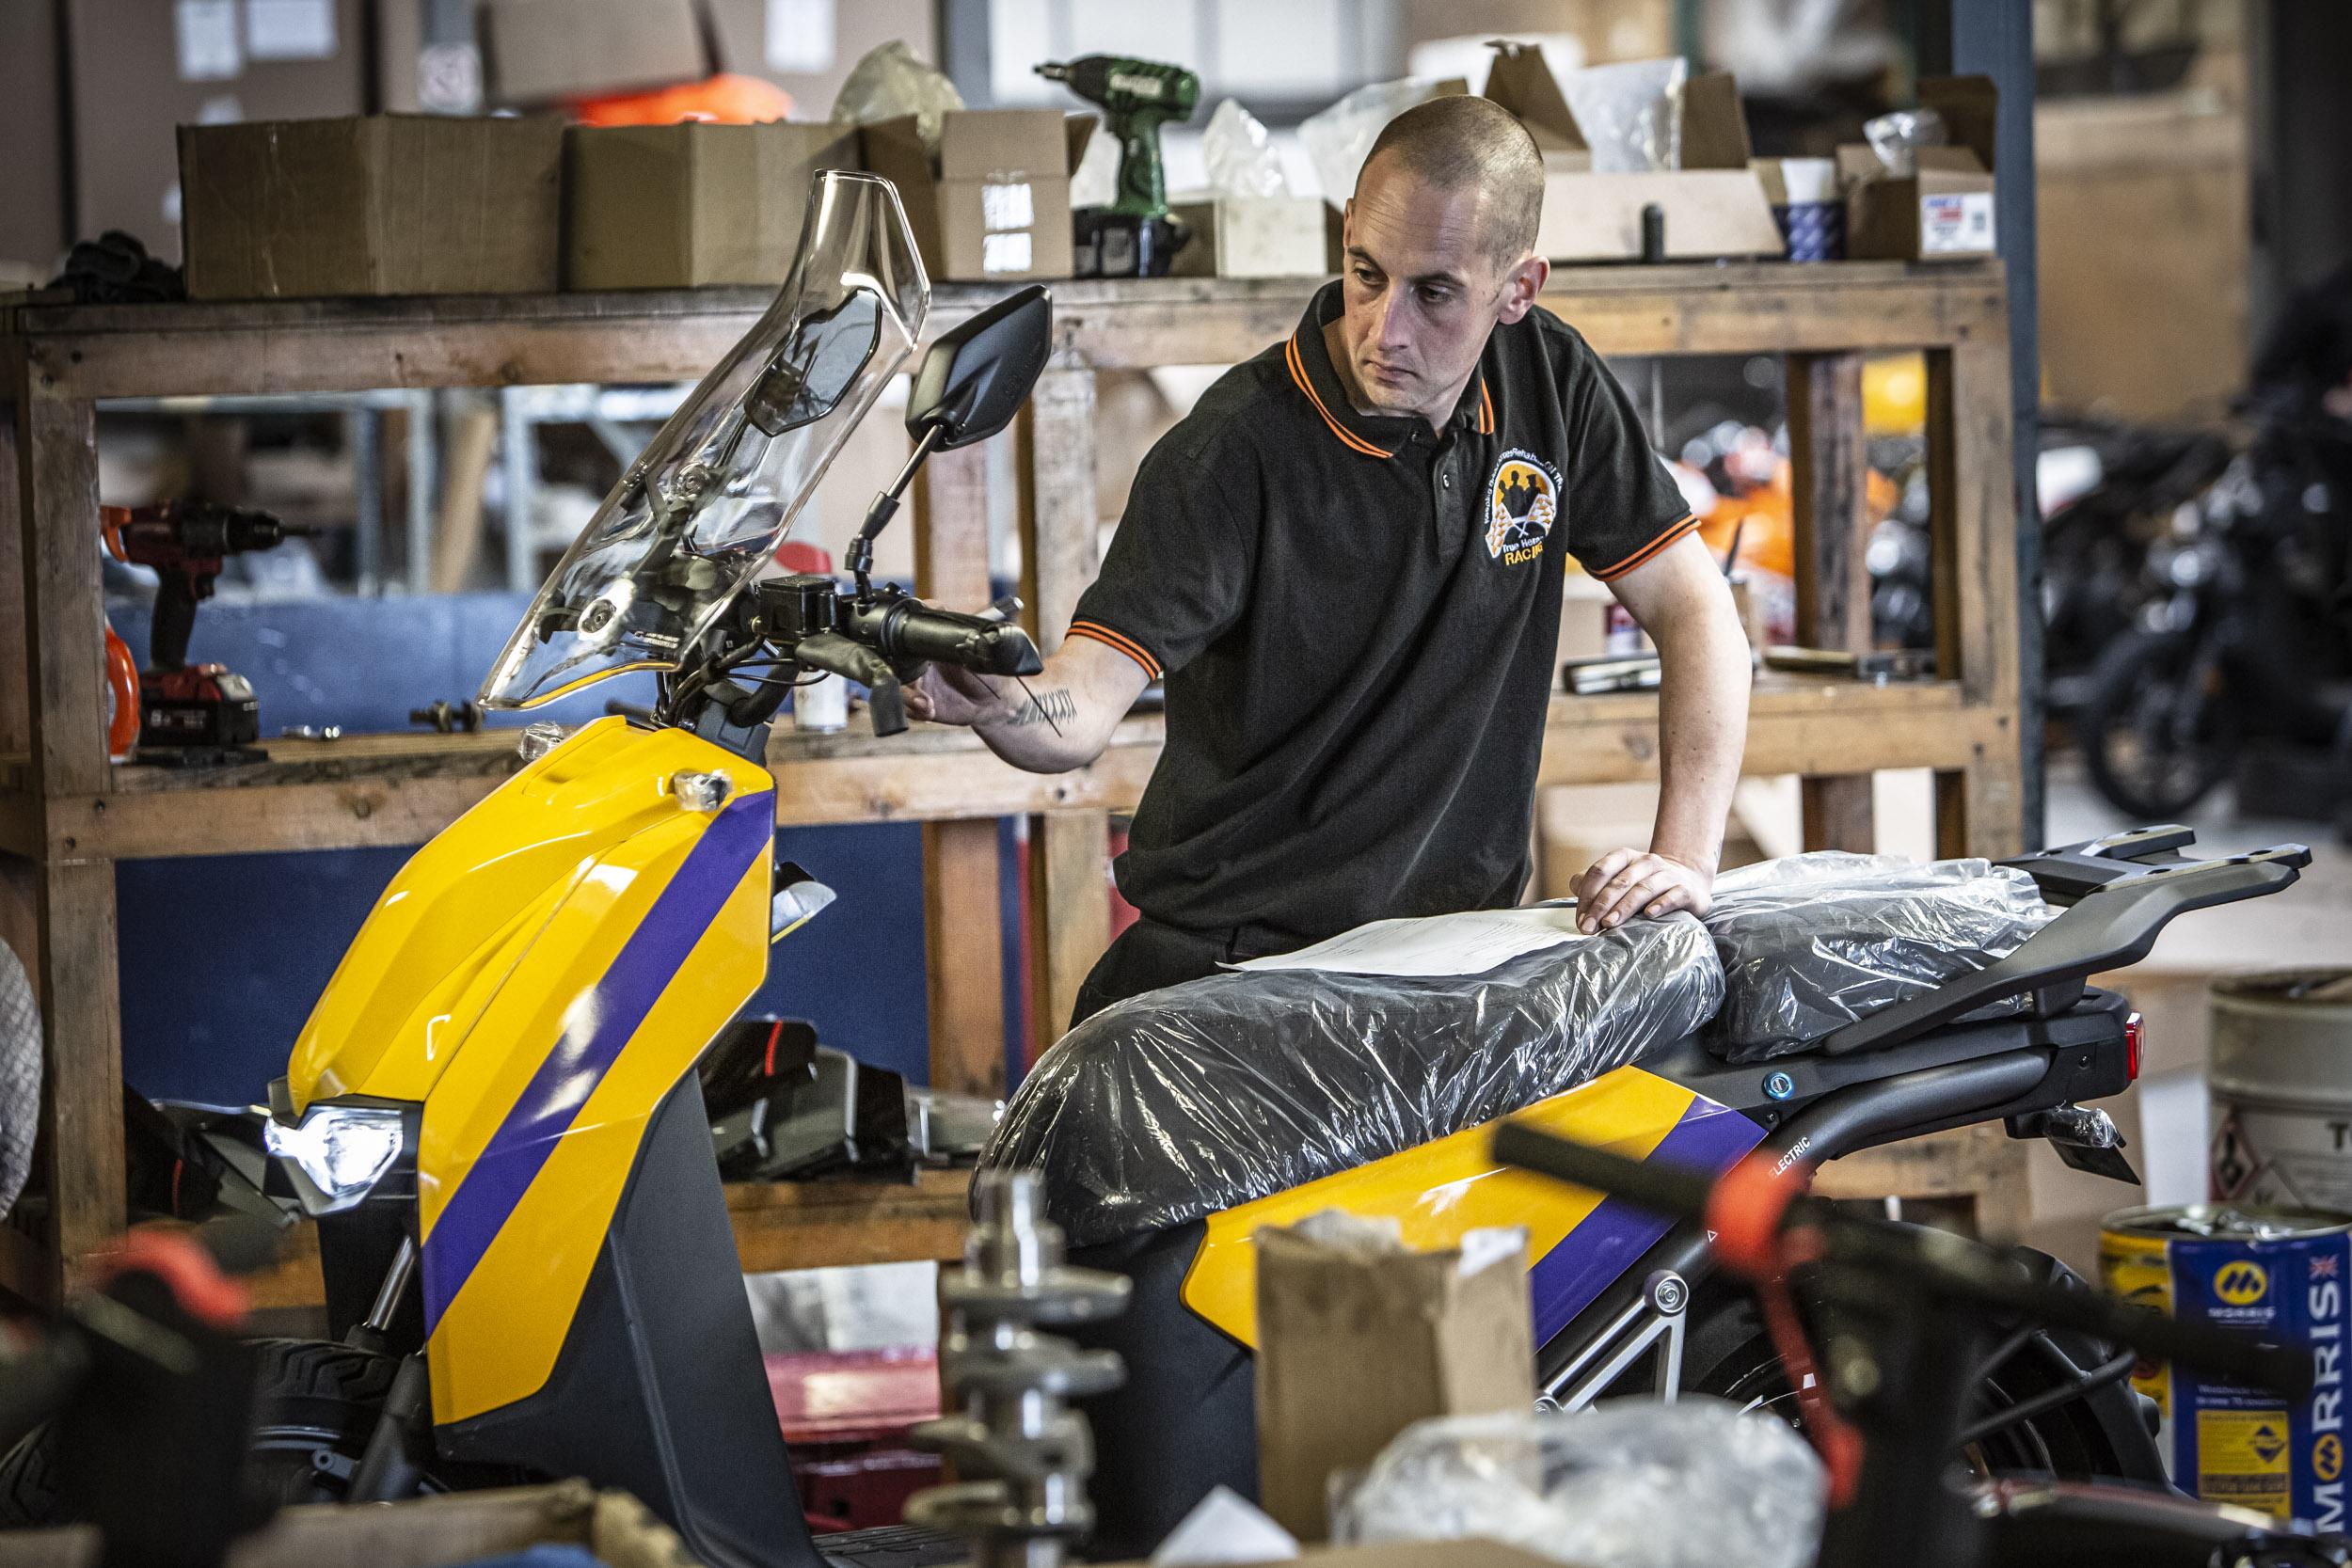 Nathan of True Heroes Racing working for Super Soco UK